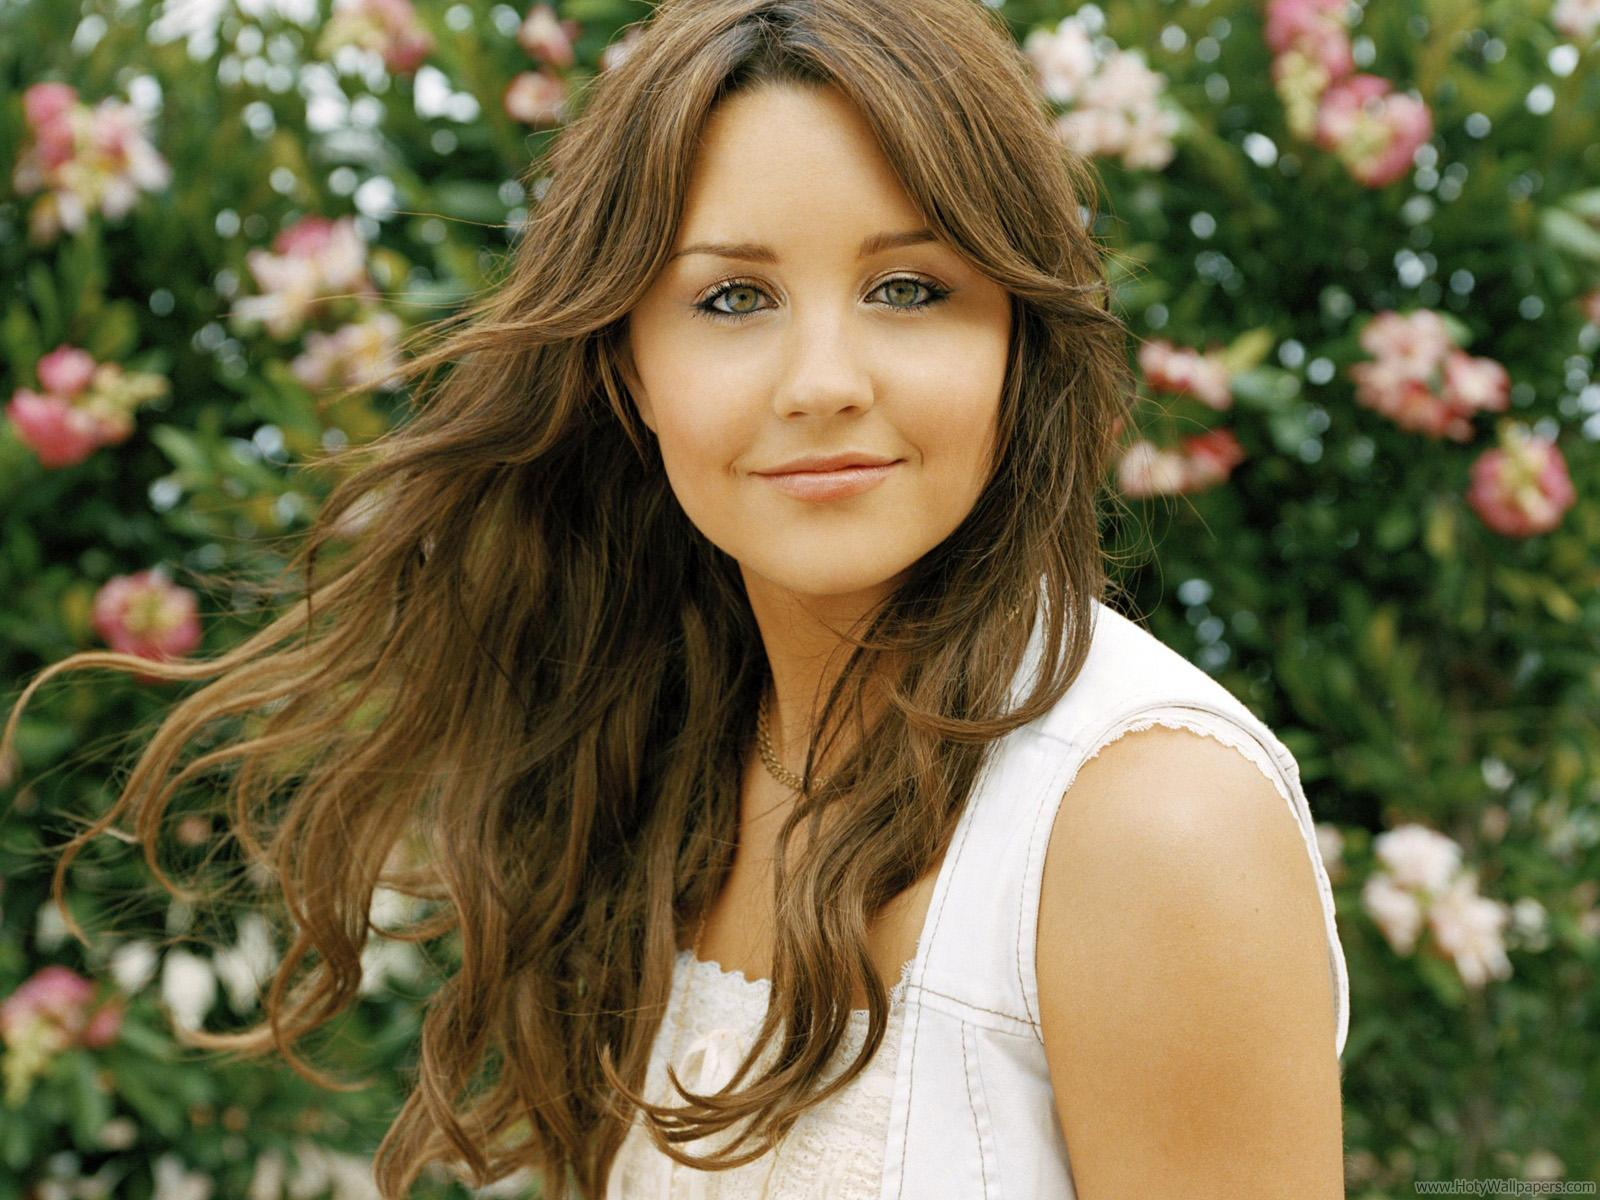 http://4.bp.blogspot.com/-c68kpwpr6gQ/Tt8ud-PjX3I/AAAAAAAACQE/ESa-EKO5Y2E/s1600/amanda_bynes_actress_fantastic_wallpaper-1440x1280.jpg